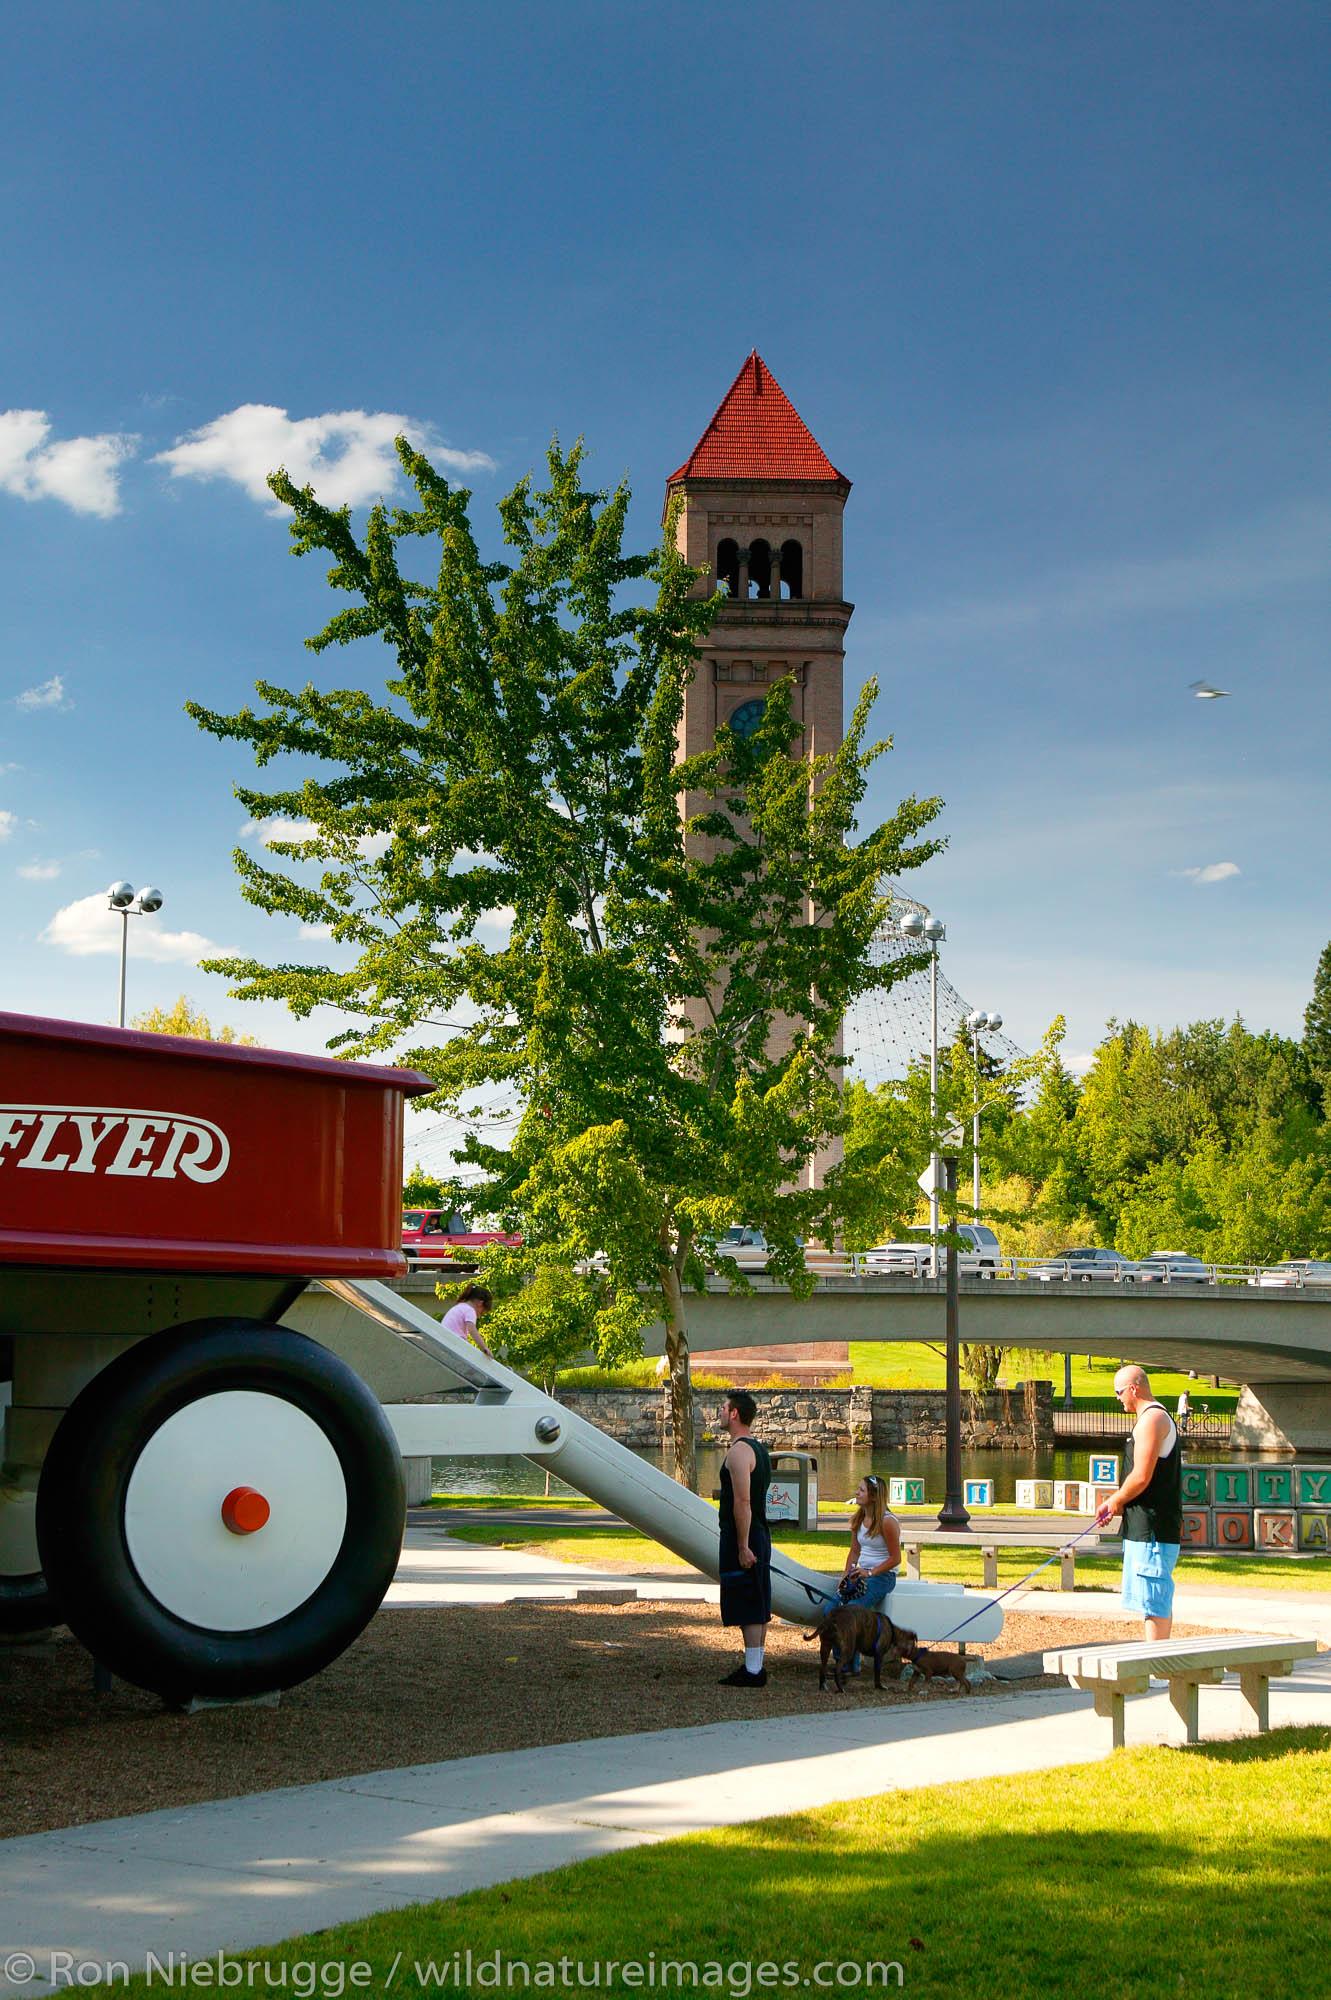 Riverfront Park, Spokane, Washington.  This was site of the 1974 World Expo.